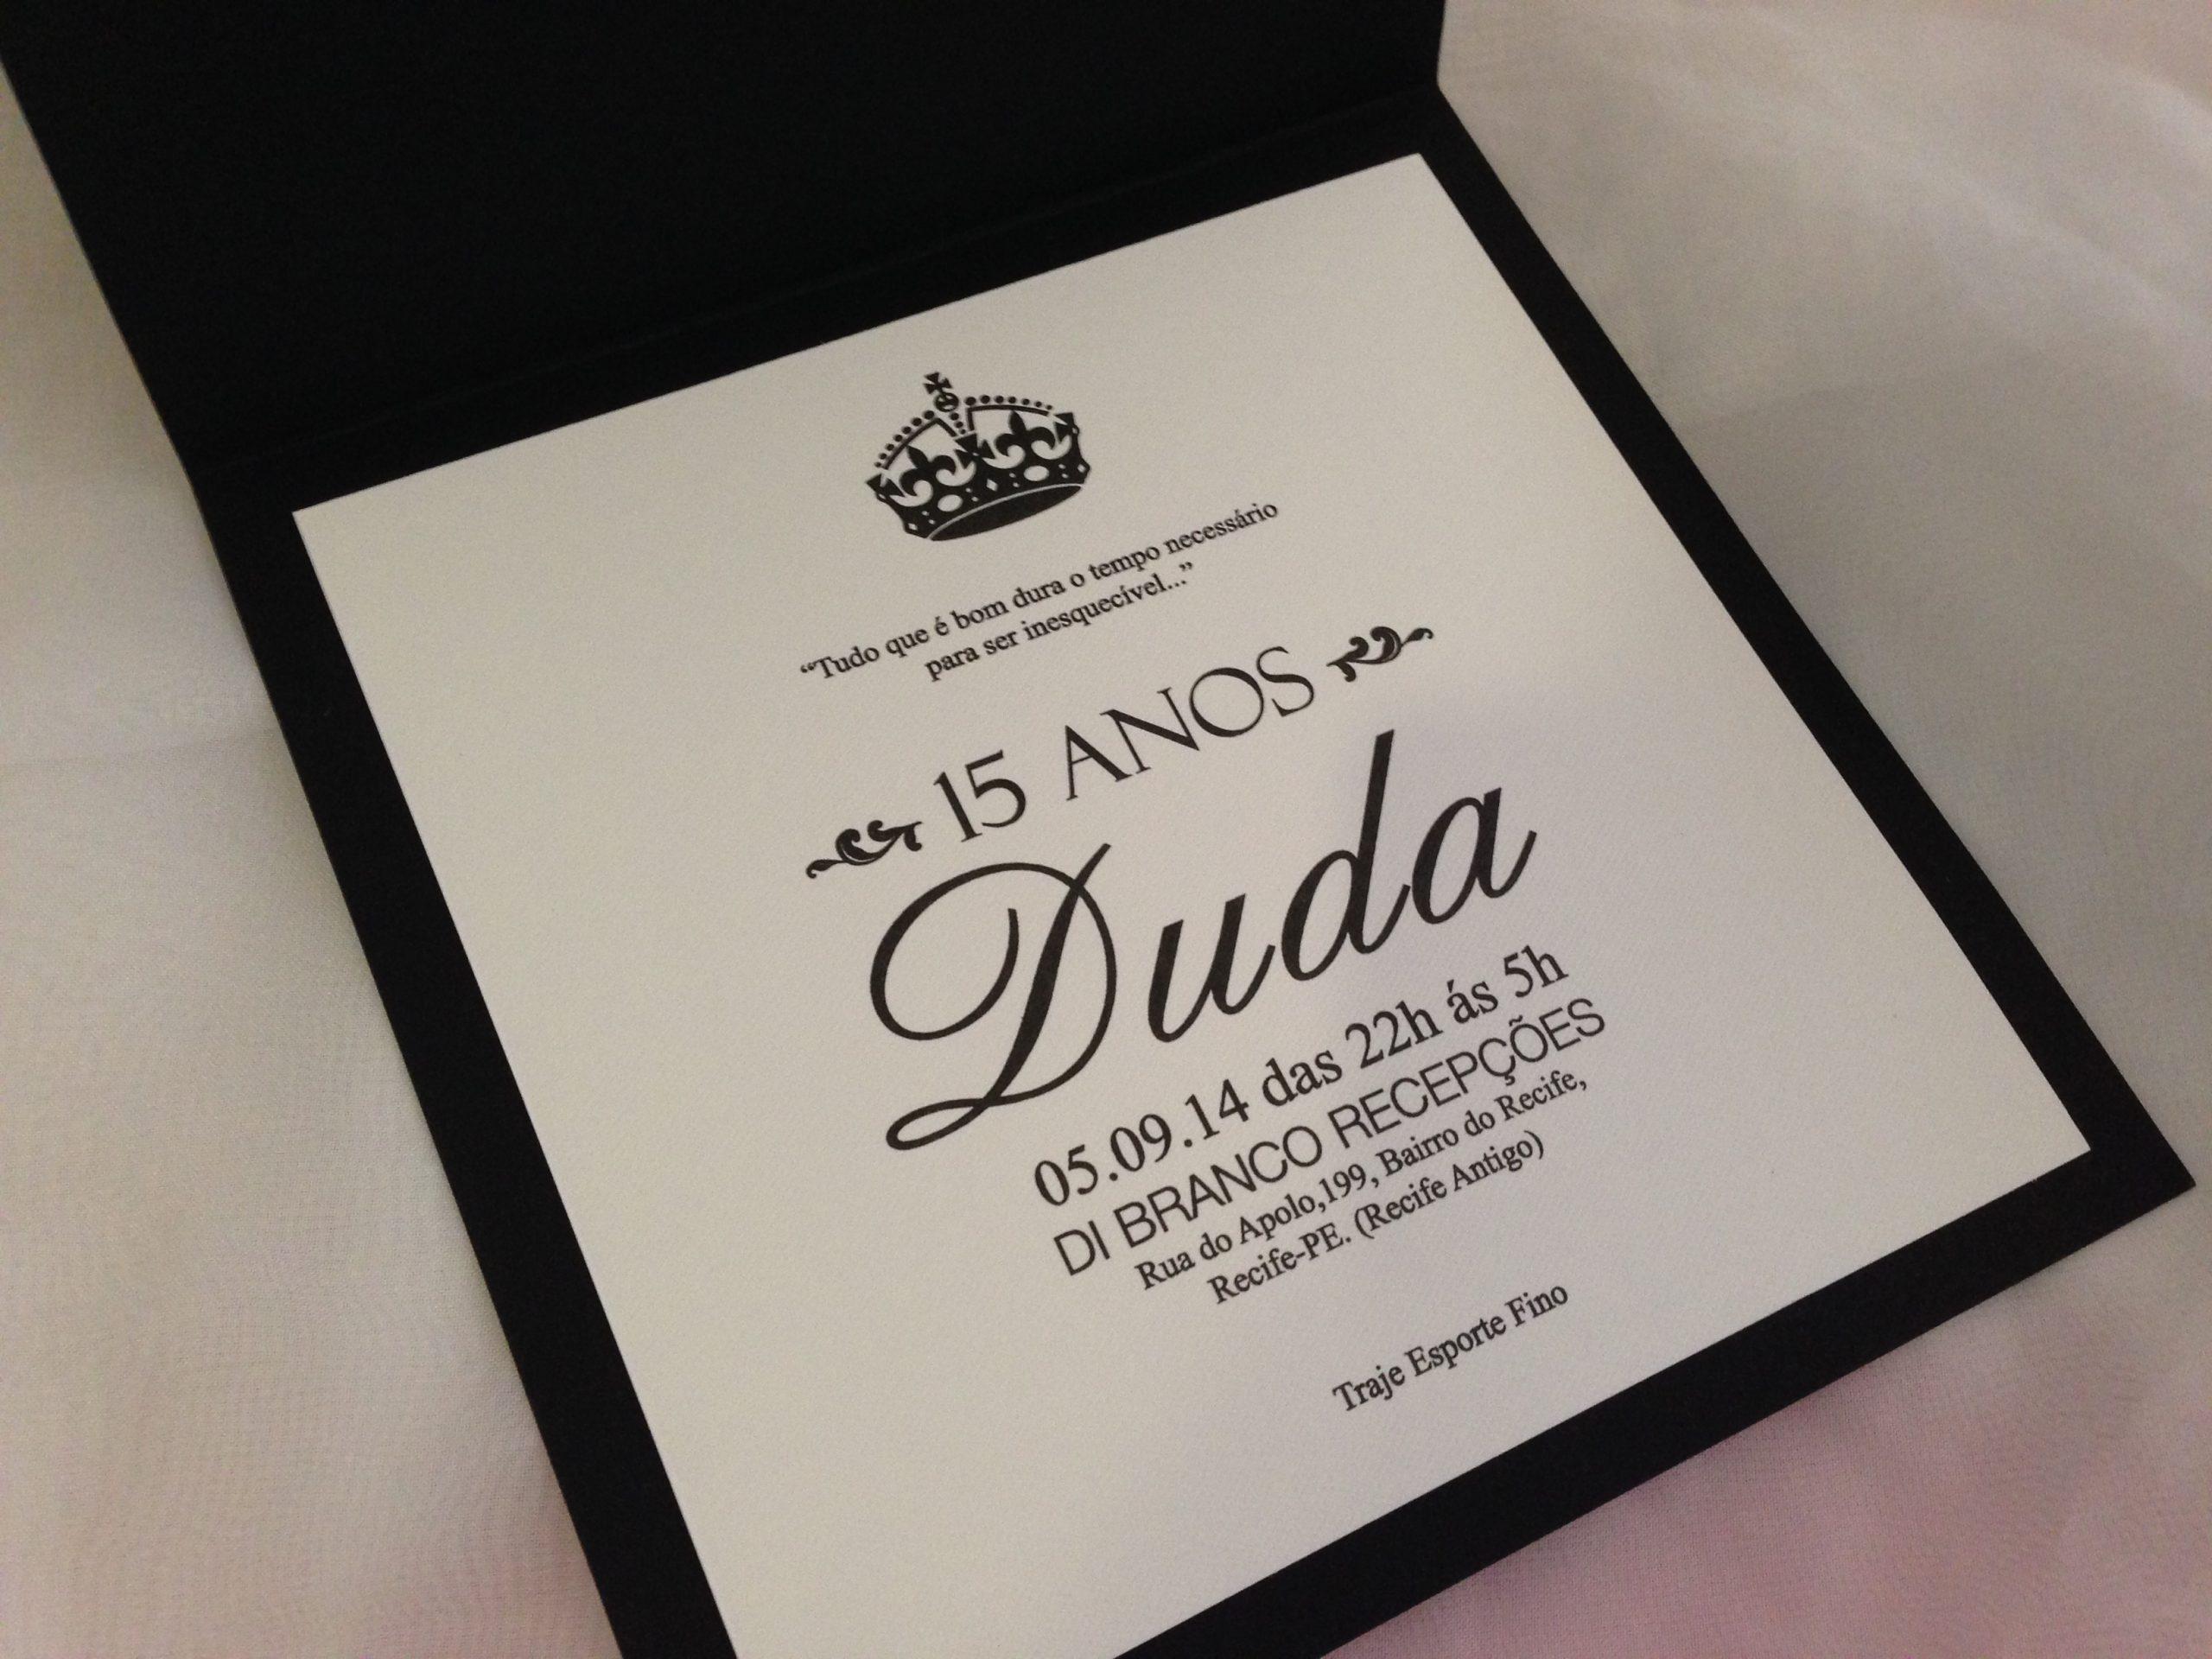 Convite 15 anos Duda -